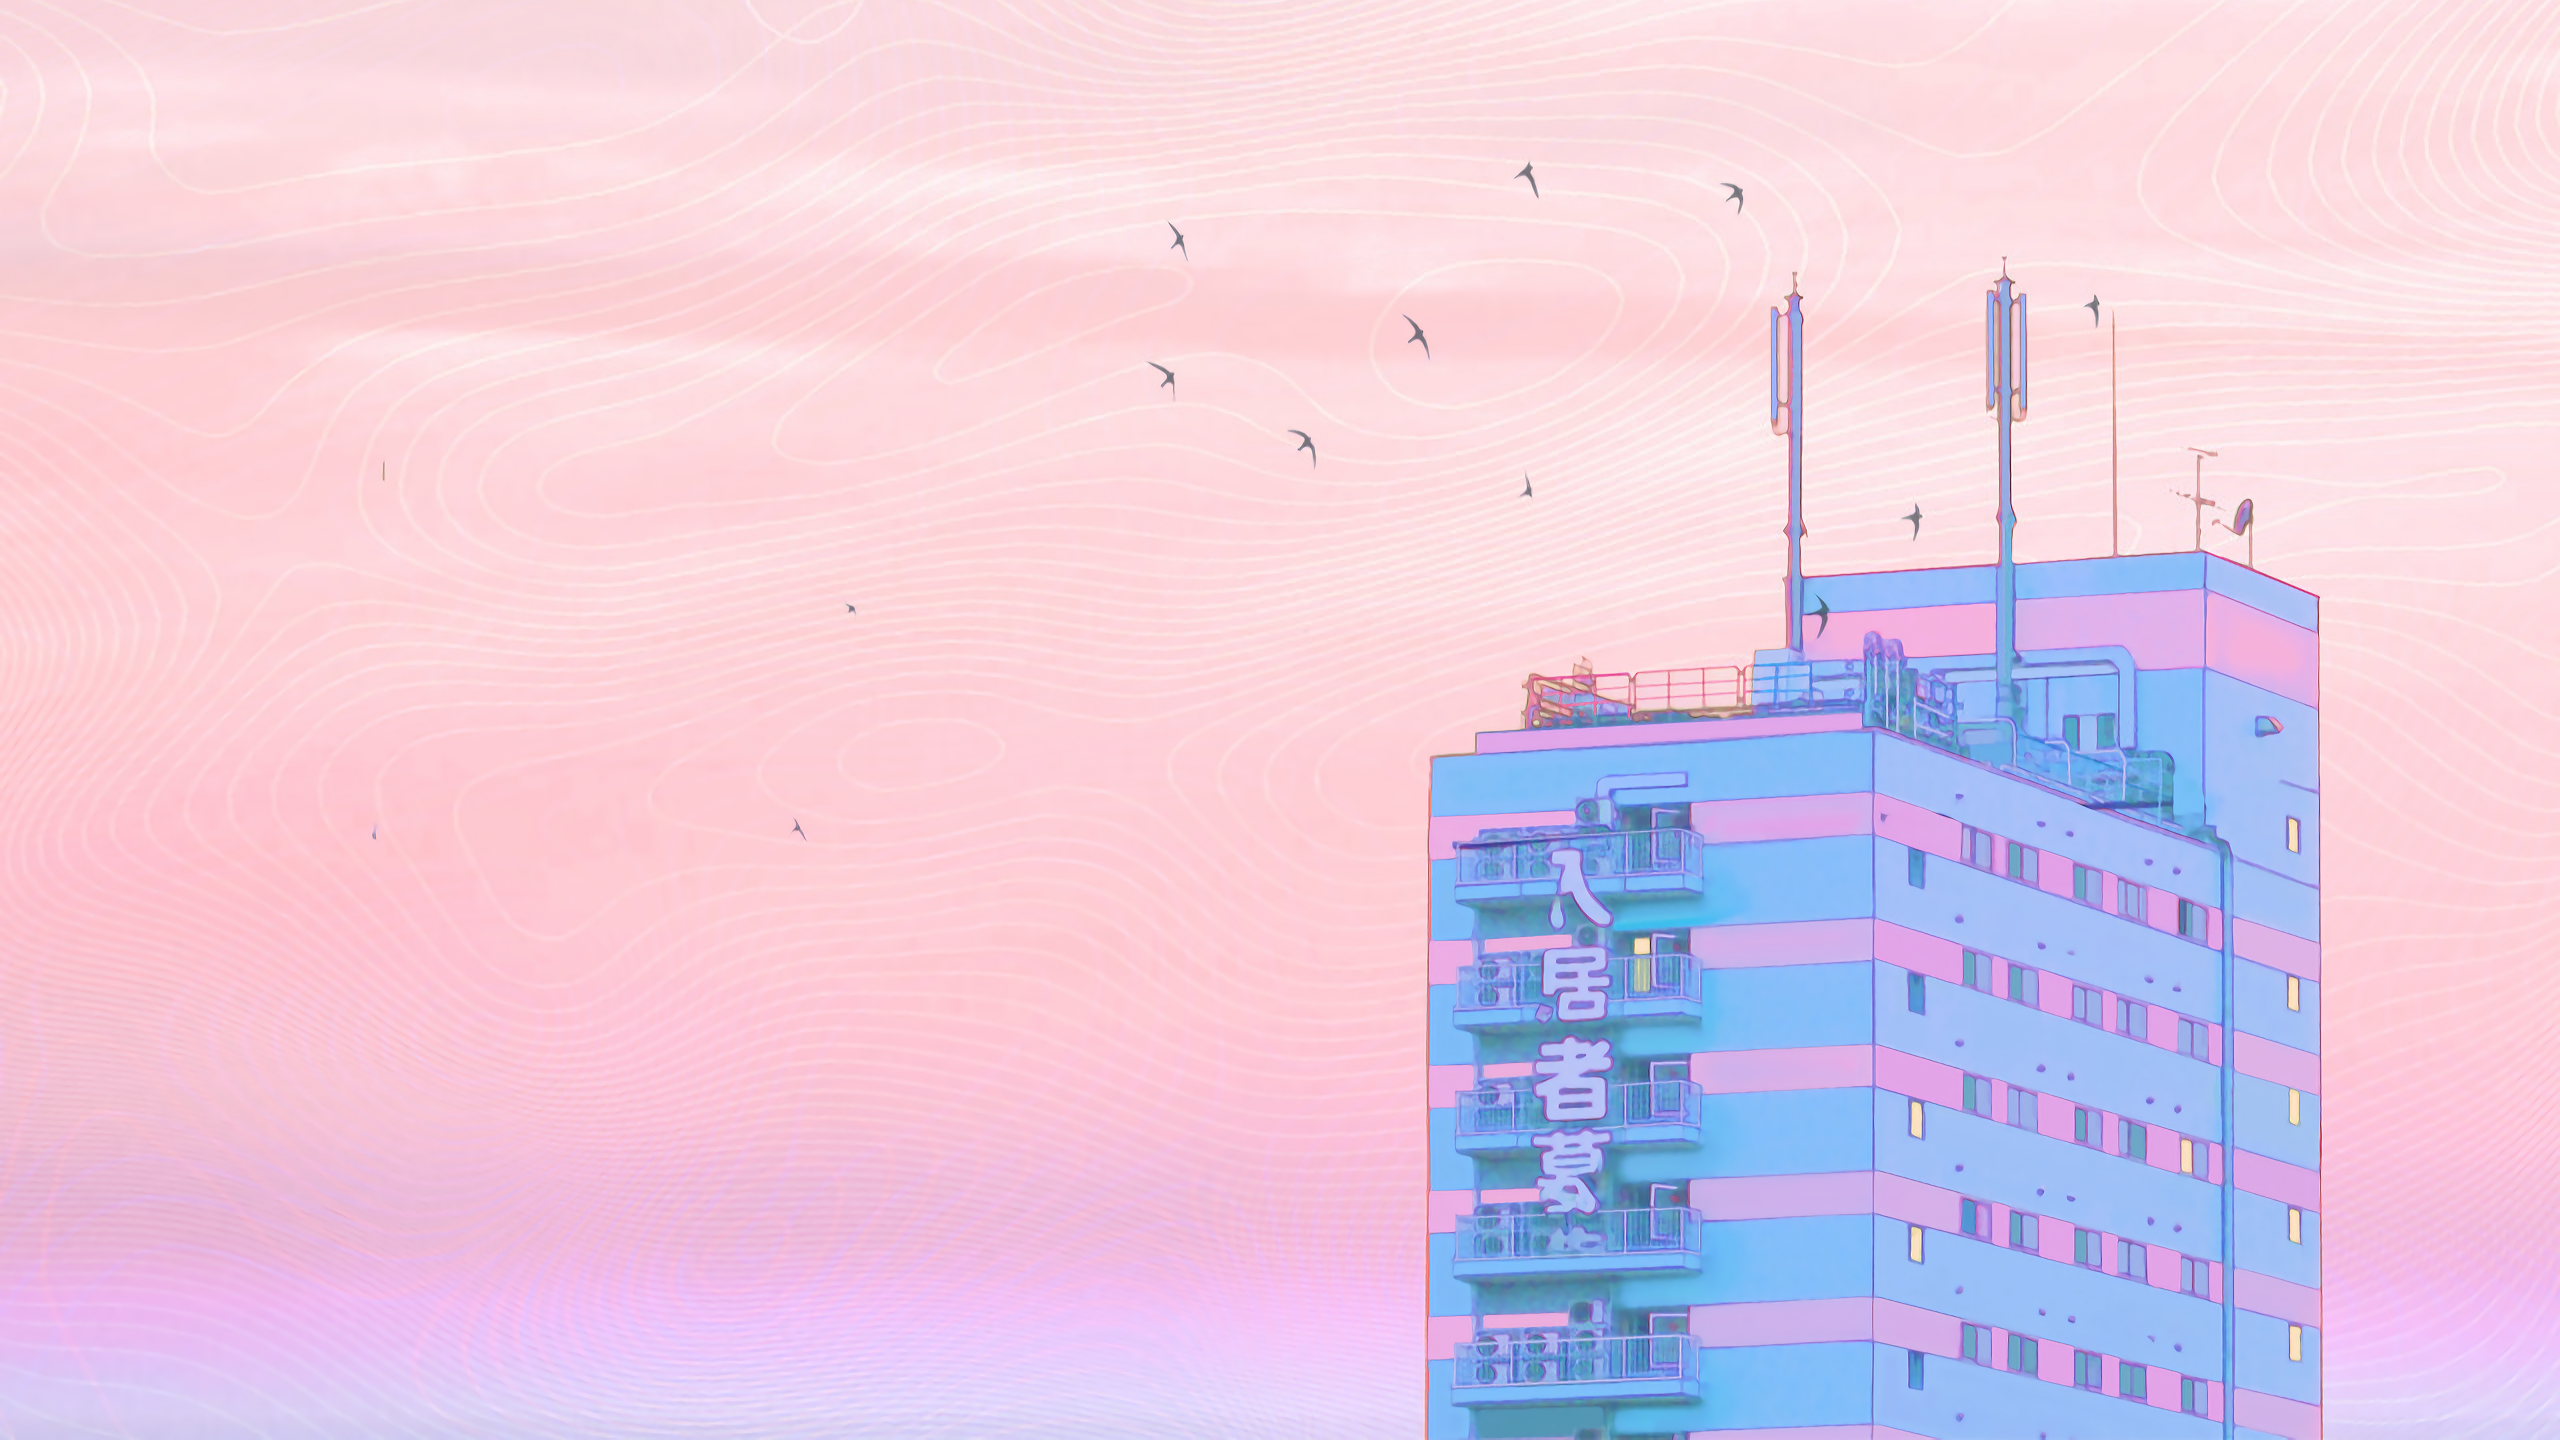 Hiroshima Dawn Owakita 2560x1440 Aesthetic Desktop Wallpaper R Wallpaper Wallpaper